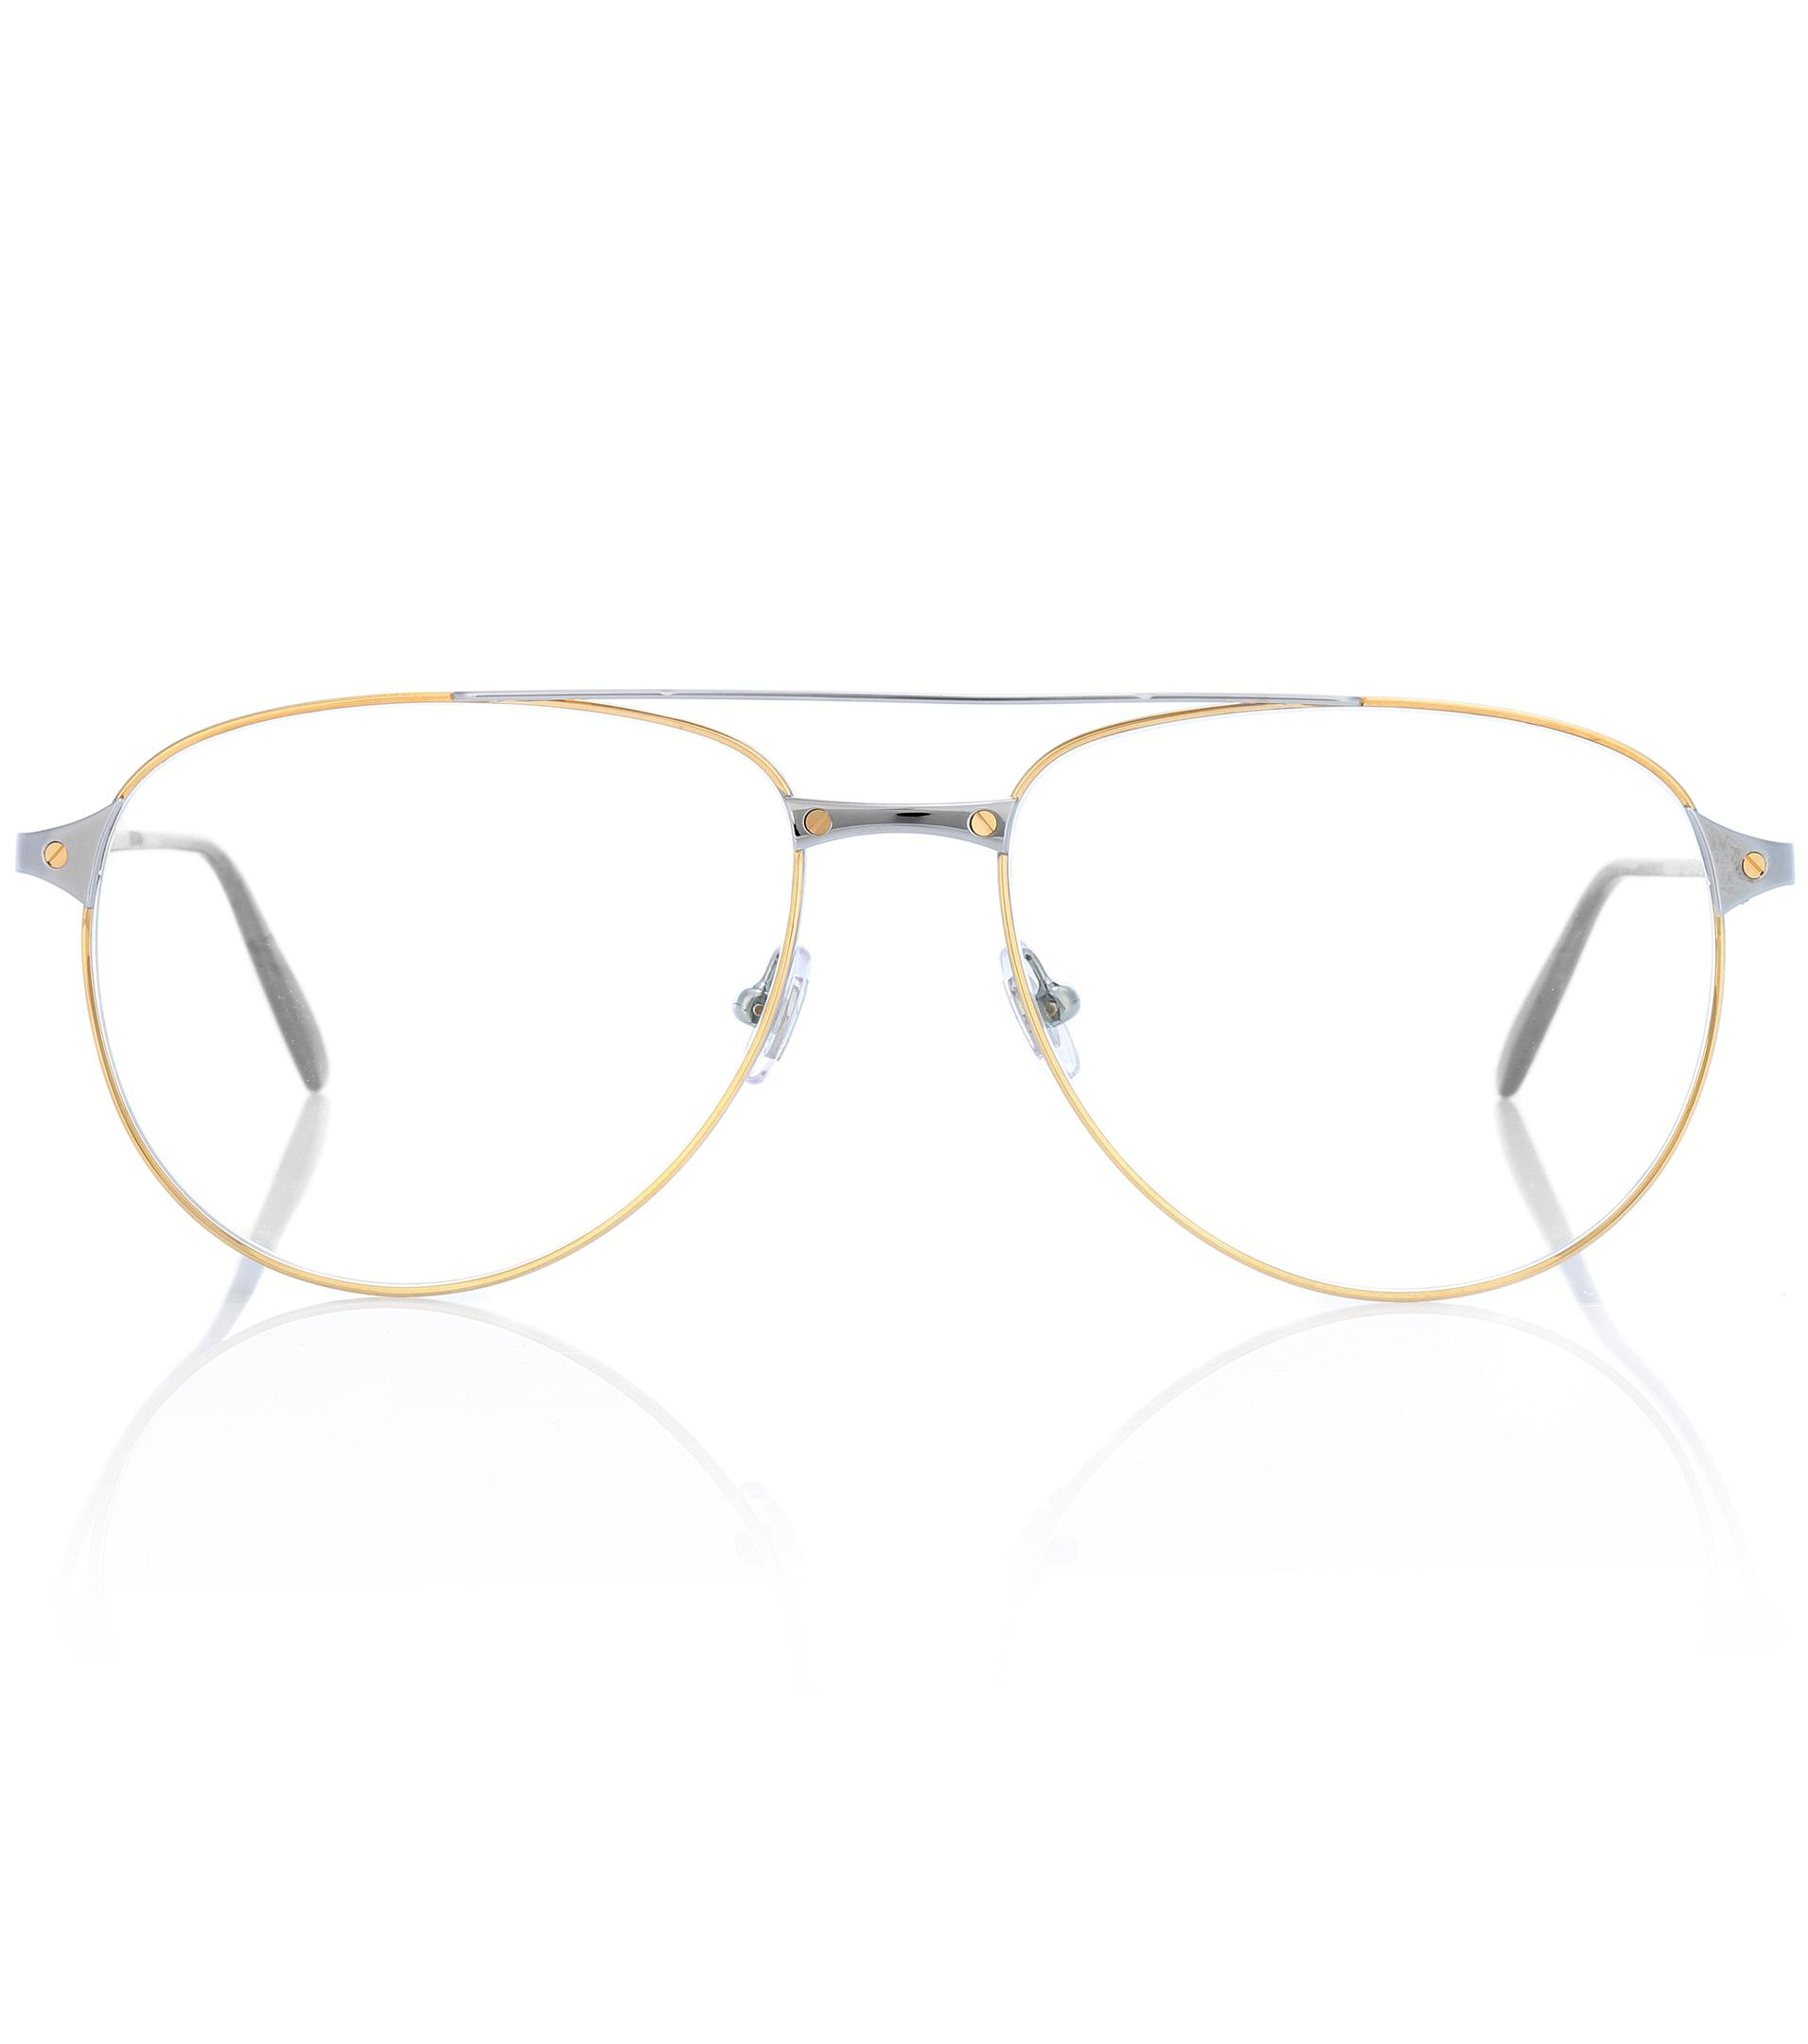 53b249376d526 Cartier Santos De Cartier Aviator Glasses in Metallic - Lyst